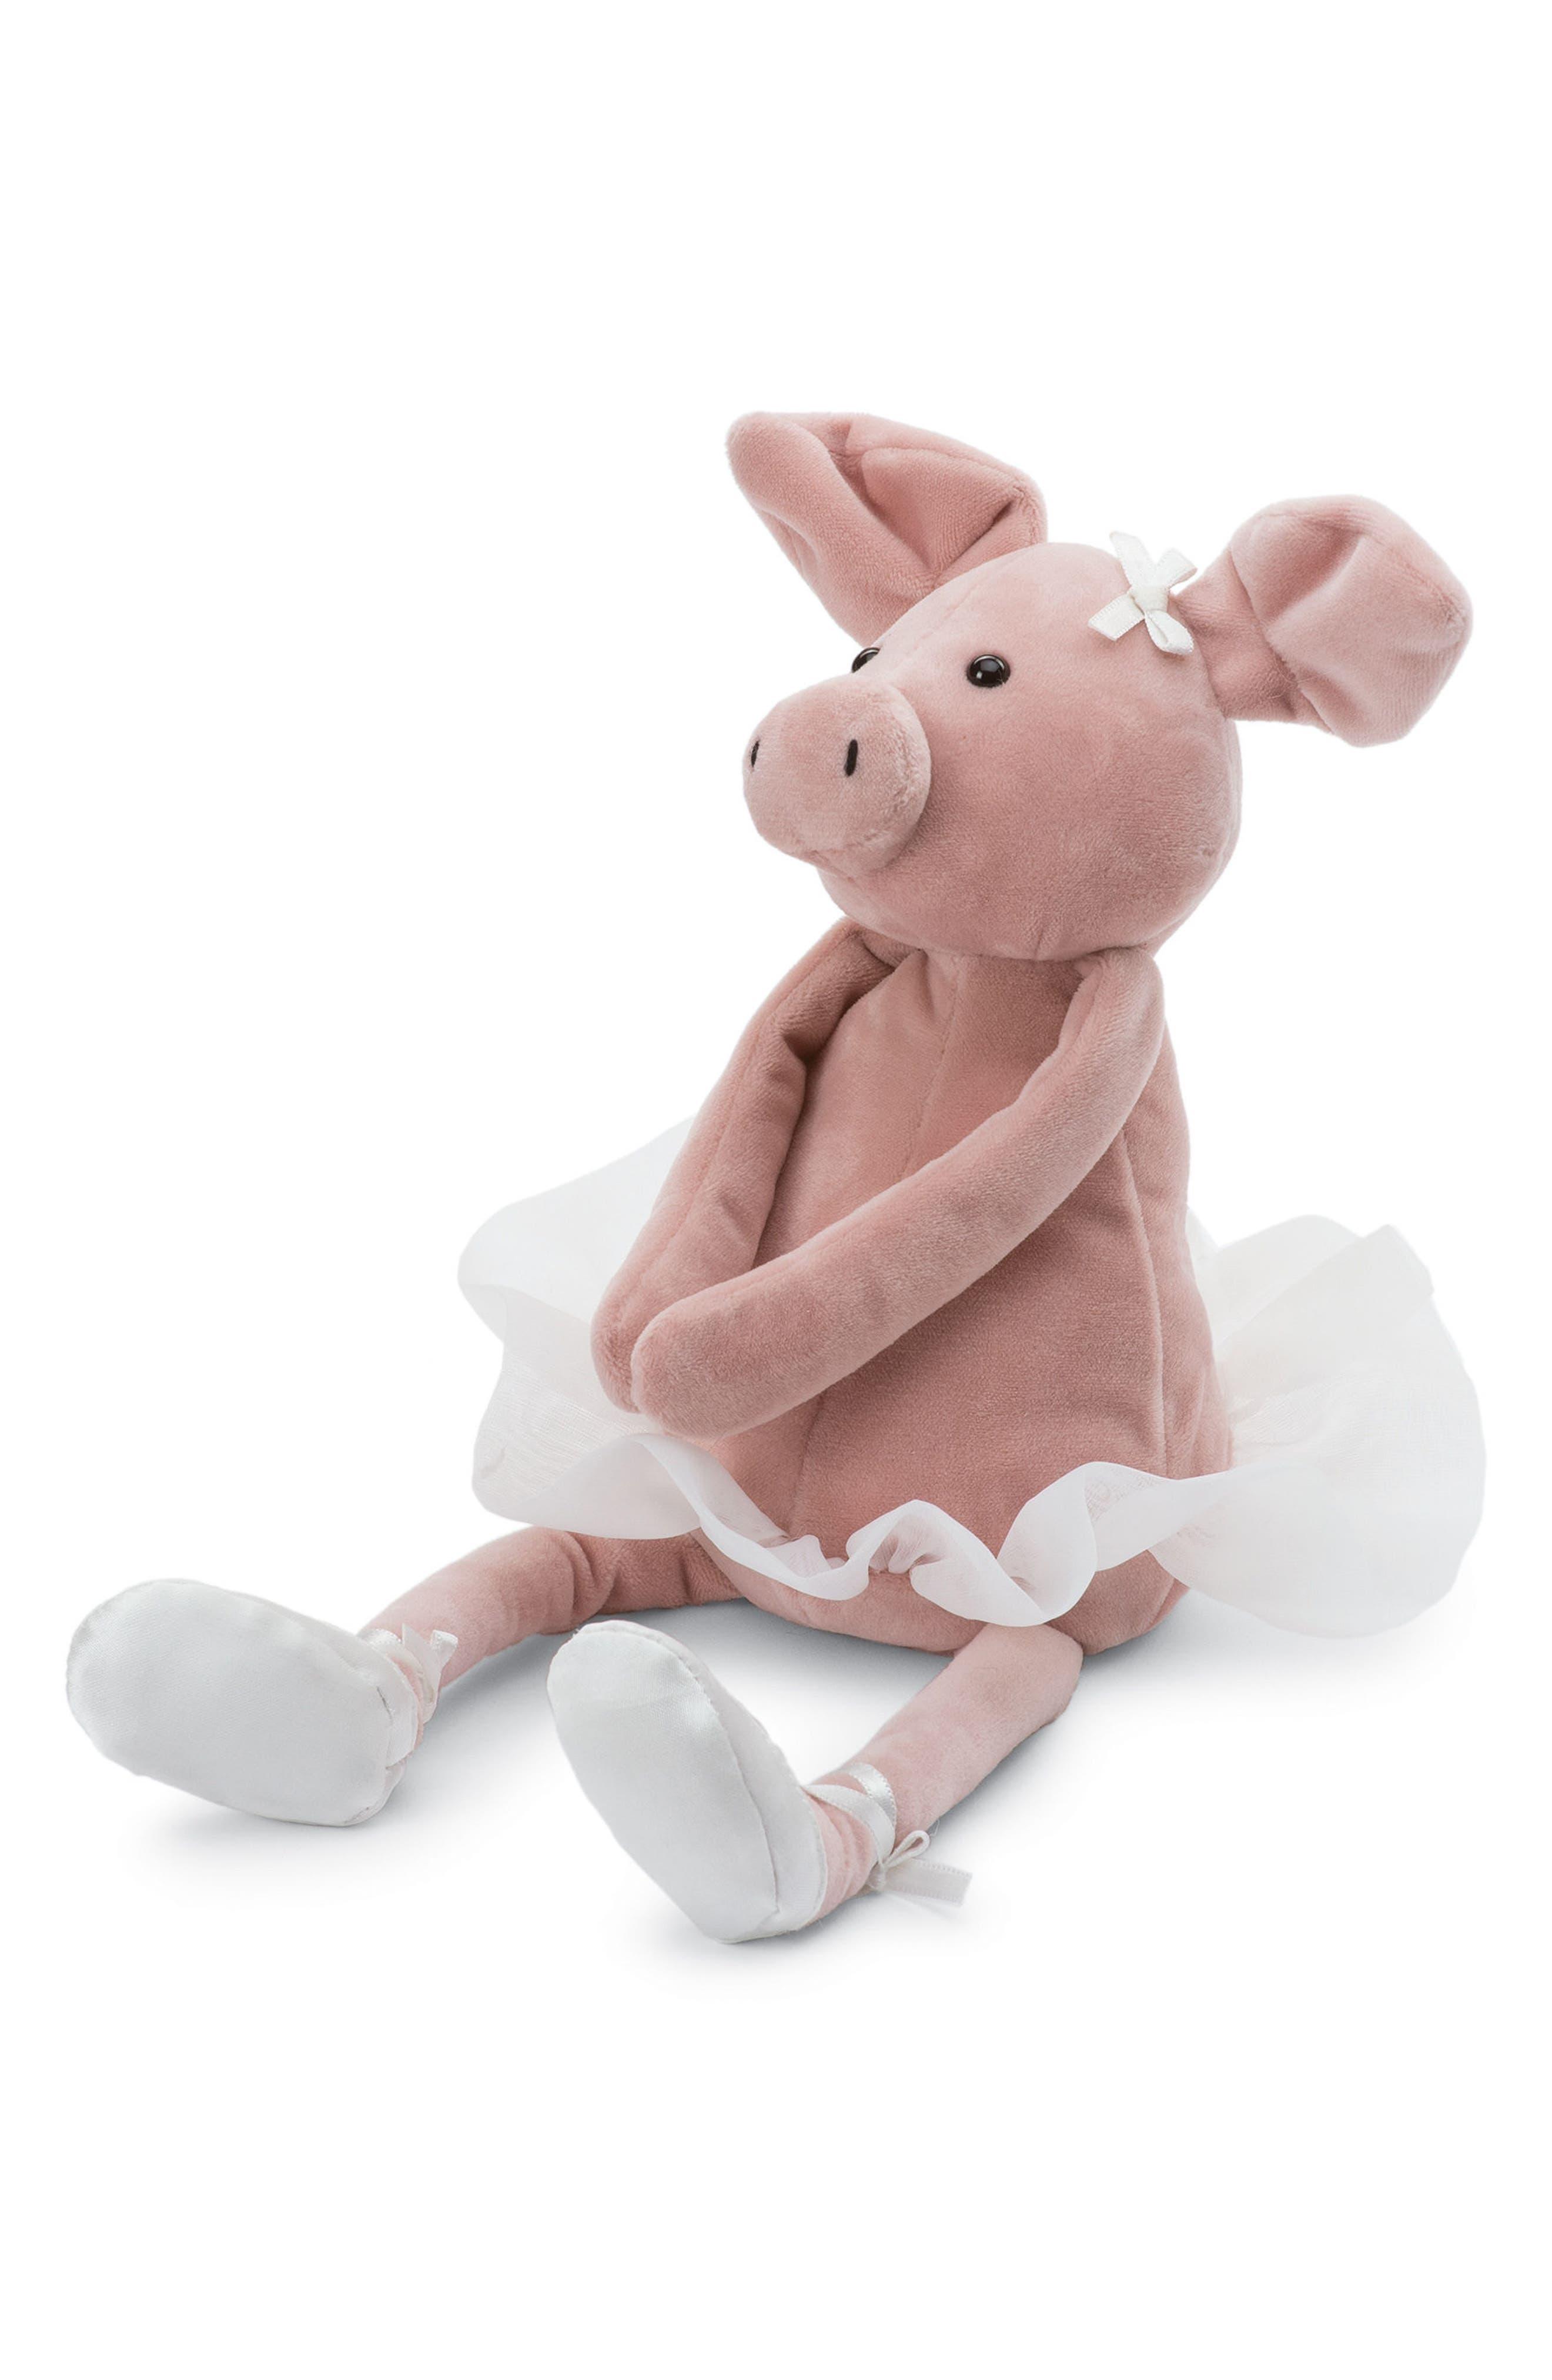 Dancing Darcey Piglet Stuffed Animal,                         Main,                         color, 680